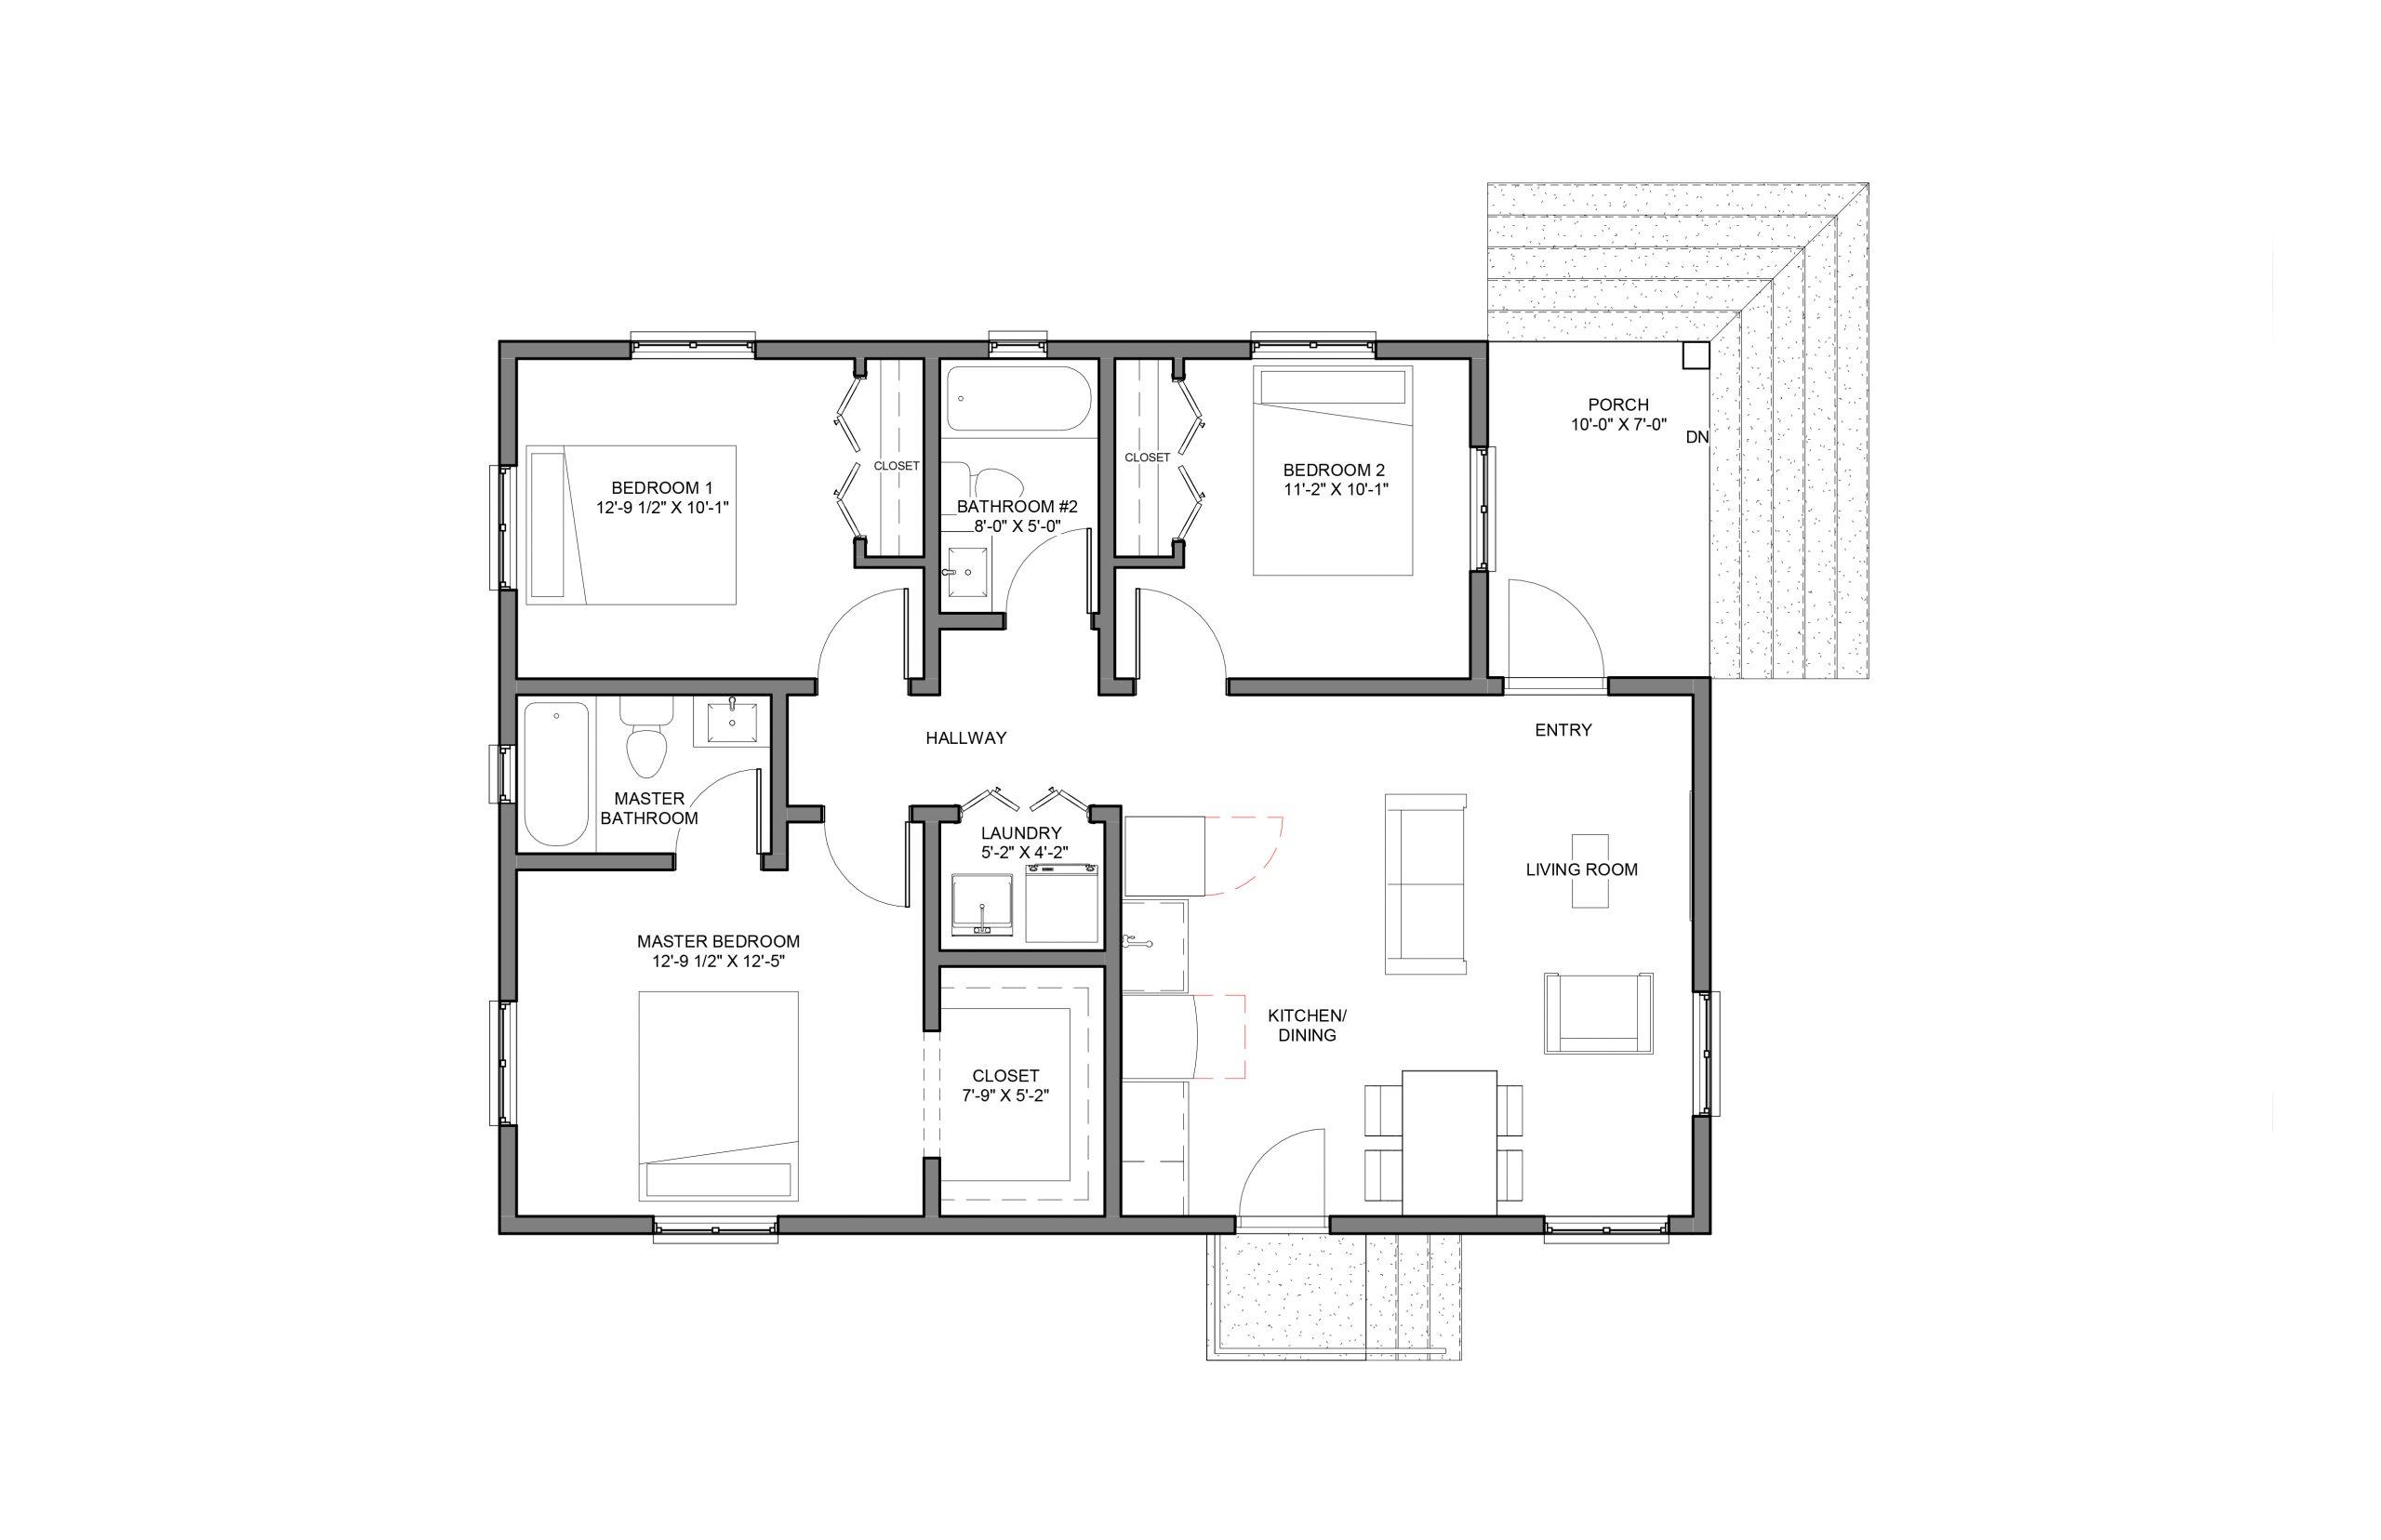 Lantern 3Bed 2Bath Option 2 Floor Plan  1060+SQFT